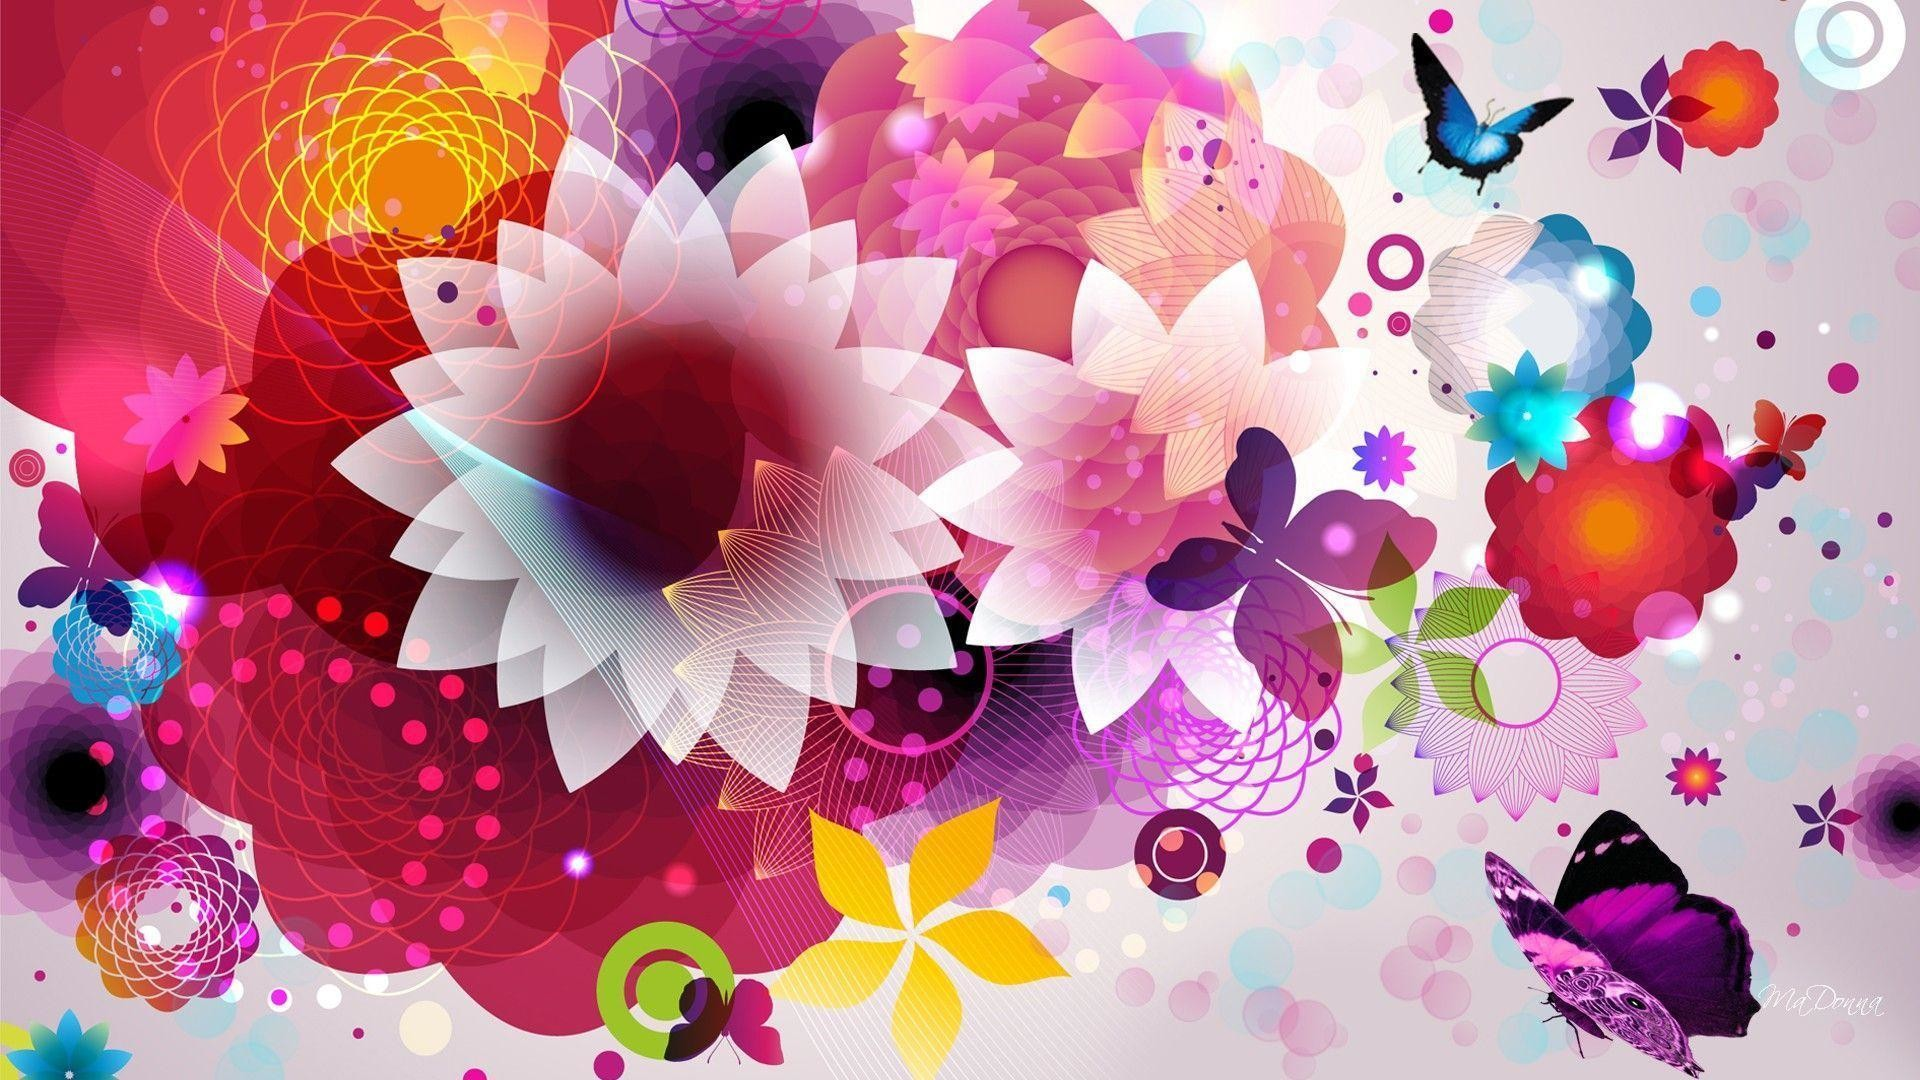 flower power wallpaper  u00b7 u2460 flower power clip art hippie clipart free flower power clipart vector